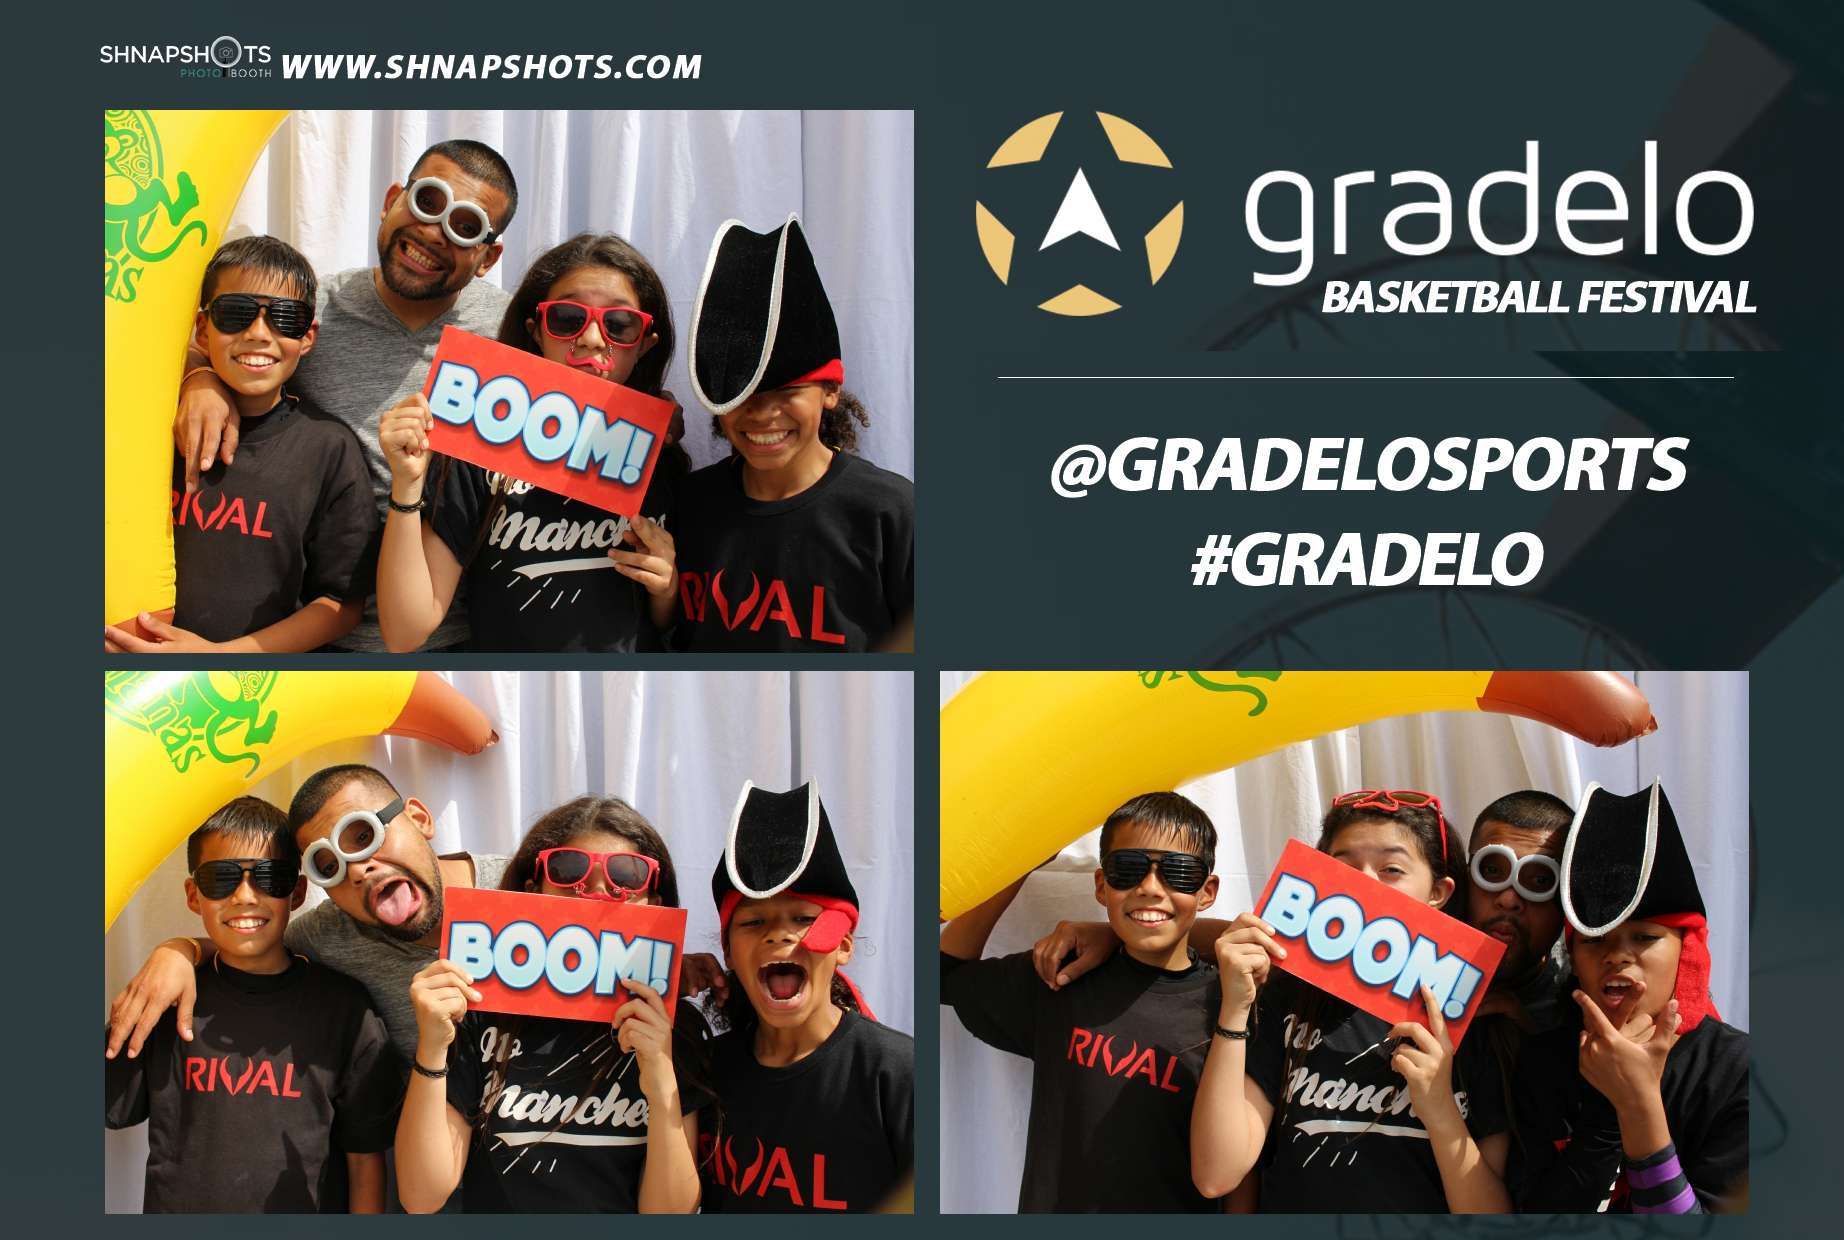 Gradelo Sports Festival